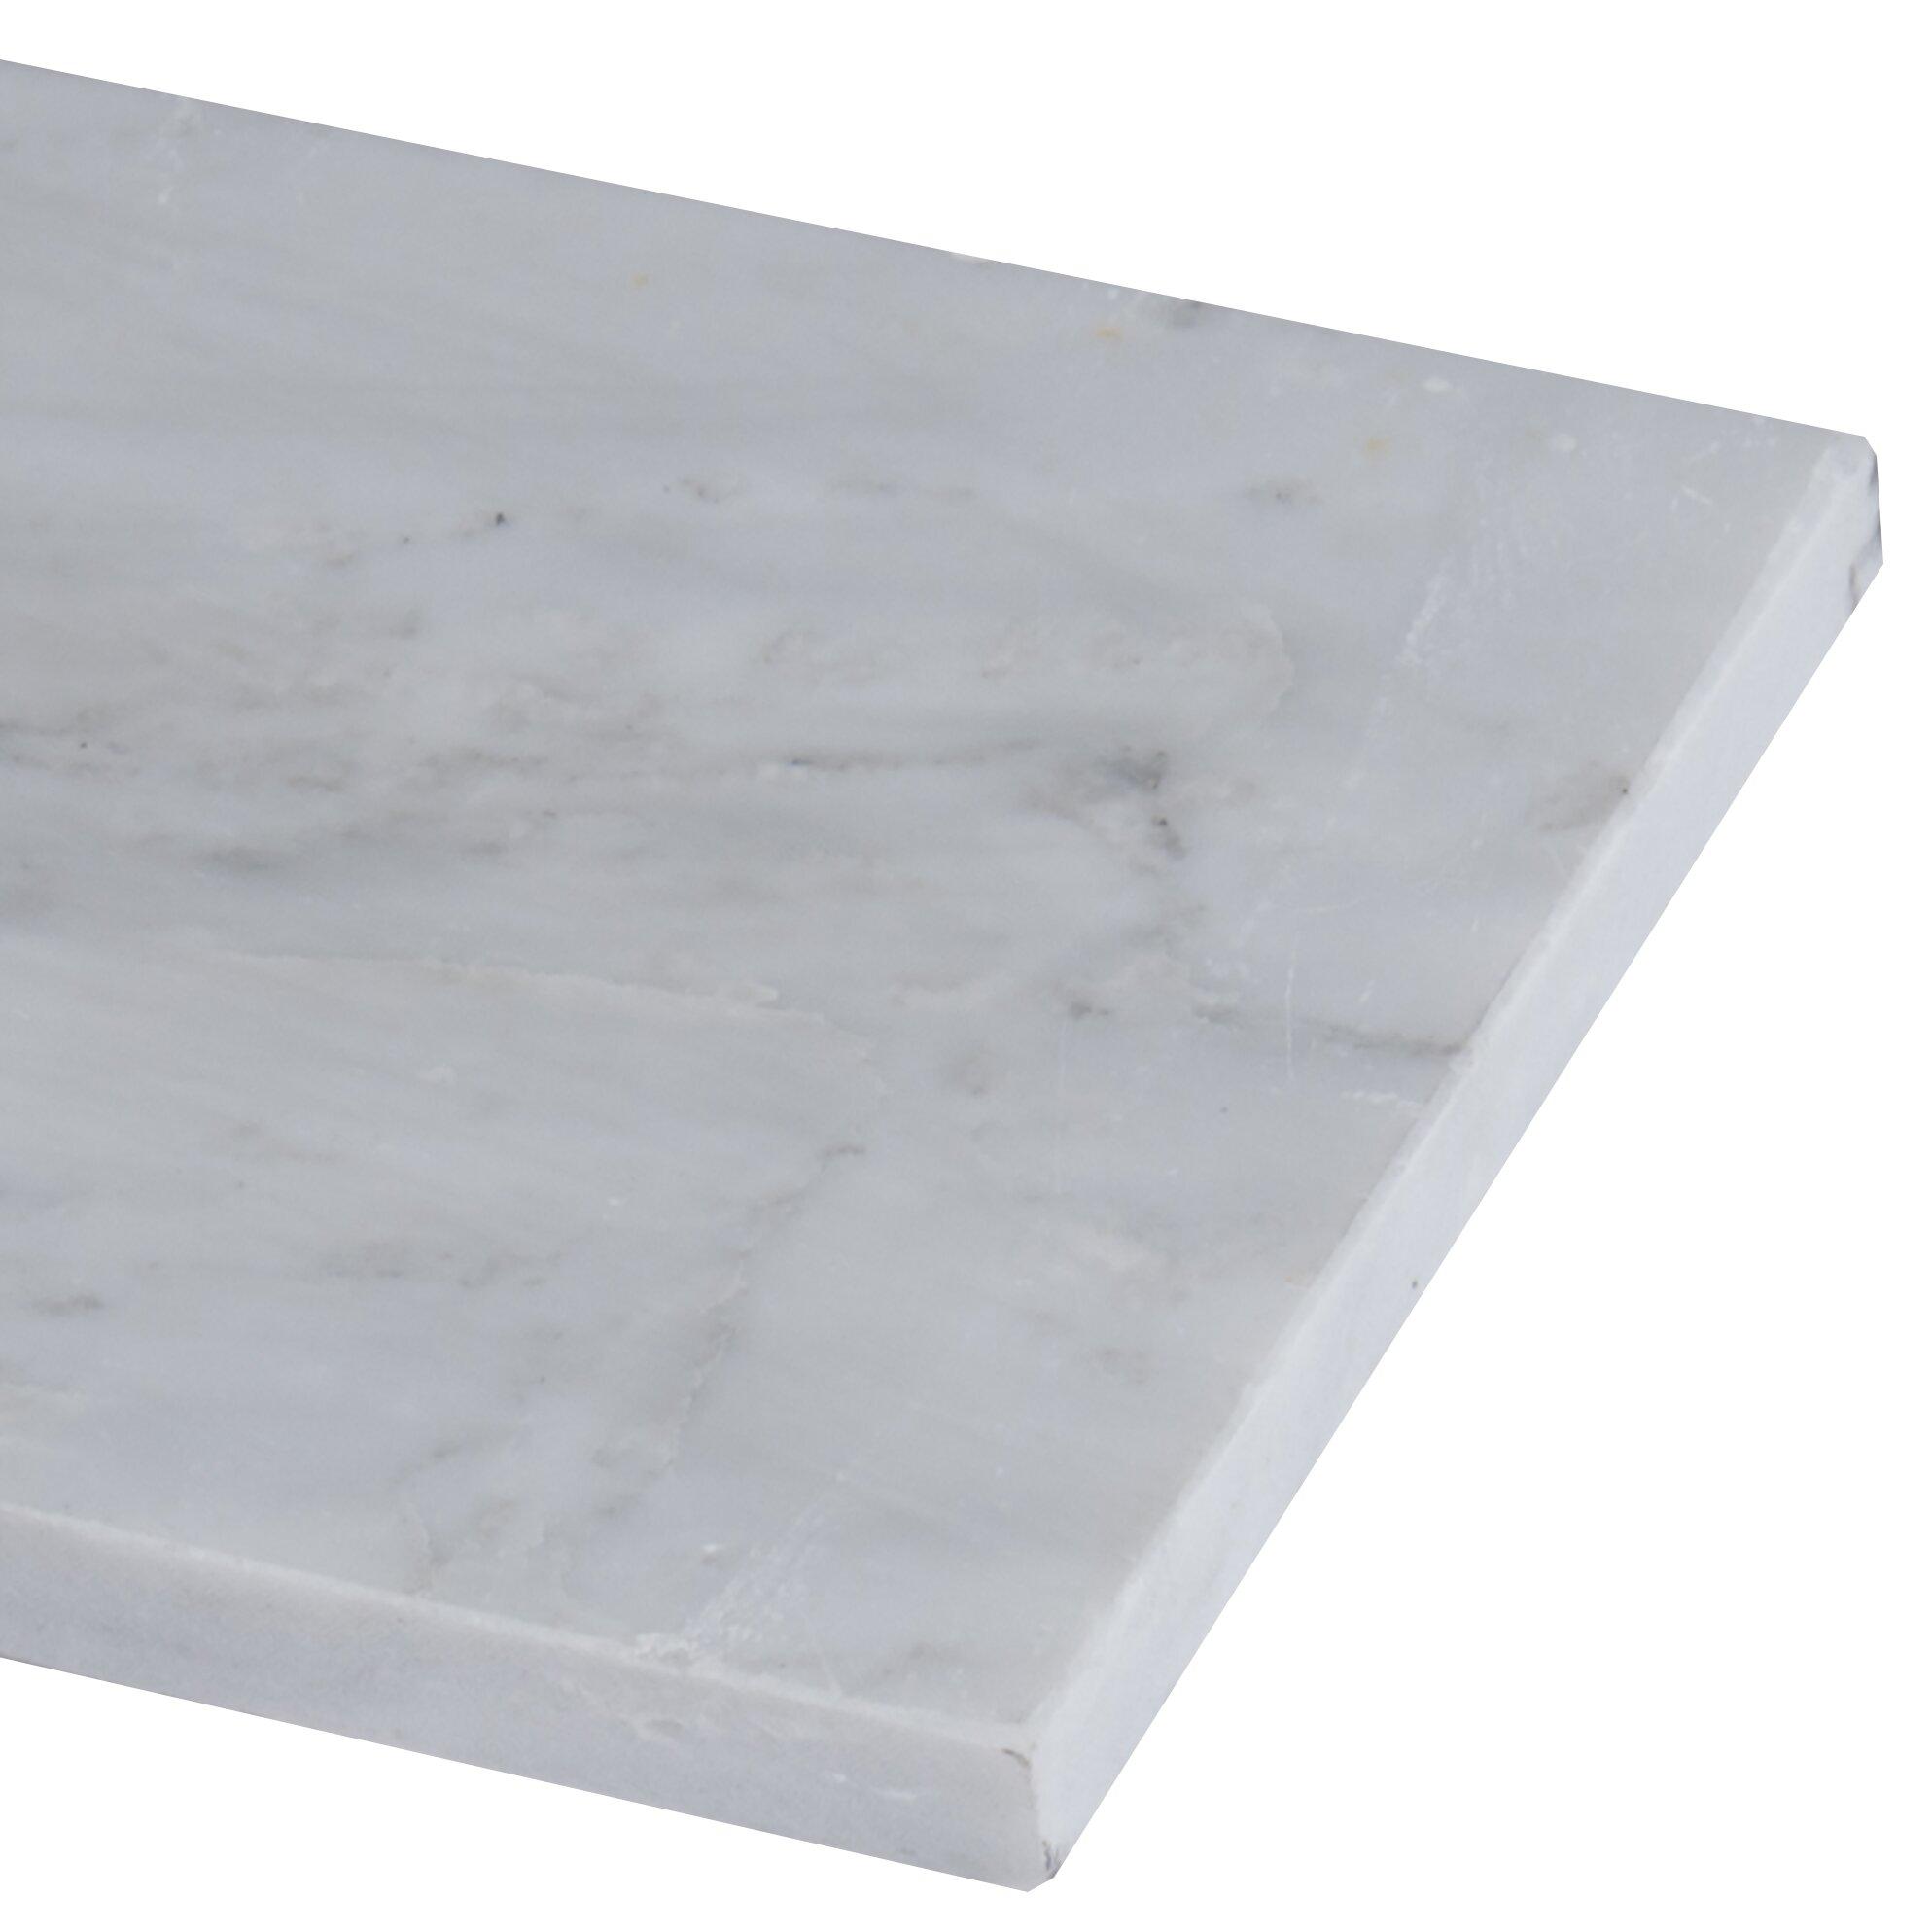 Msi 4 X 12 Honed Marble Tile In Arabescato Carrara